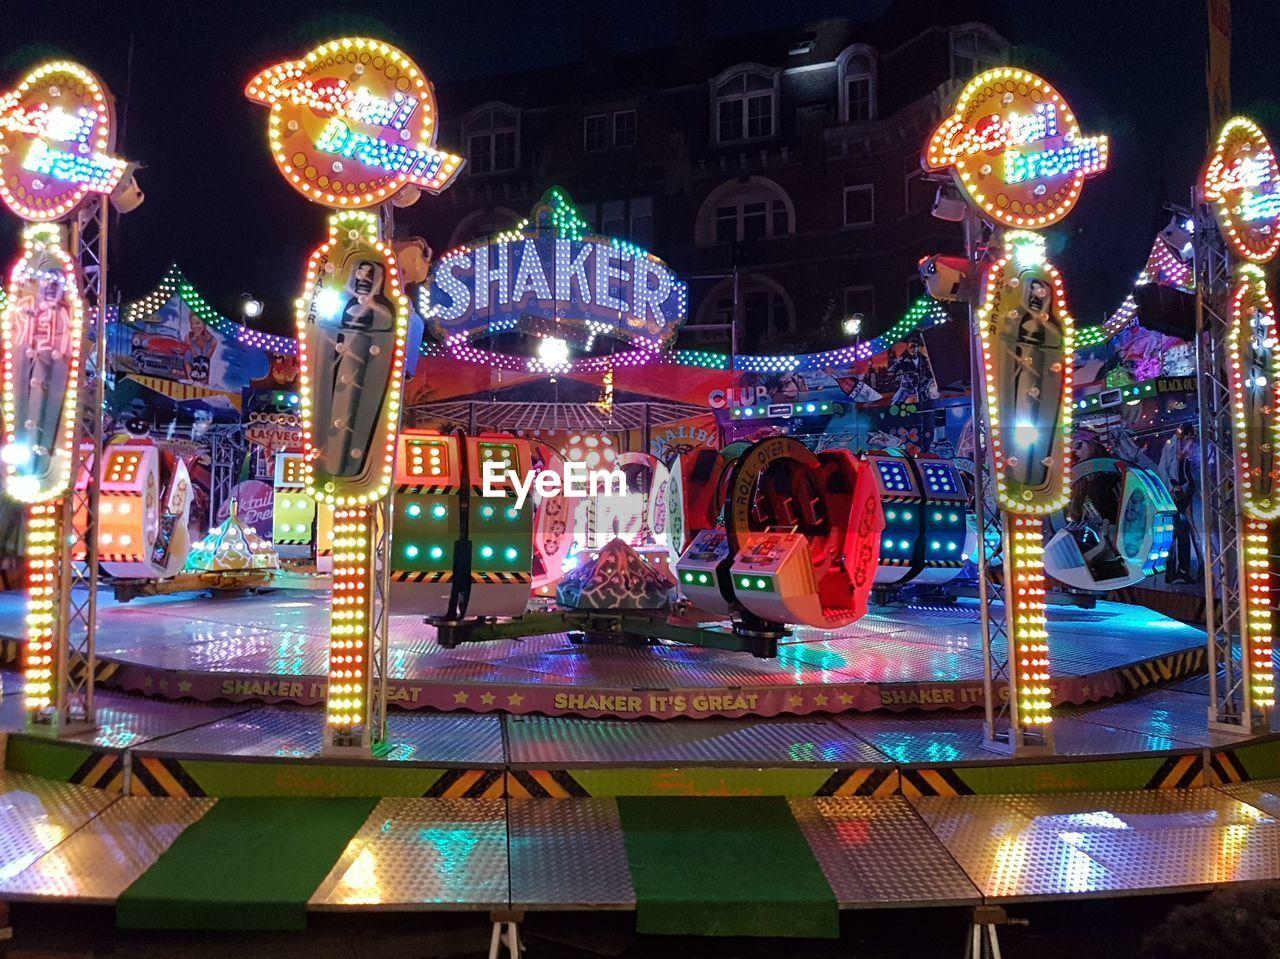 amusement park, illuminated, night, arts culture and entertainment, multi colored, amusement park ride, carousel, outdoors, no people, enjoyment, ride, christmas market, sky